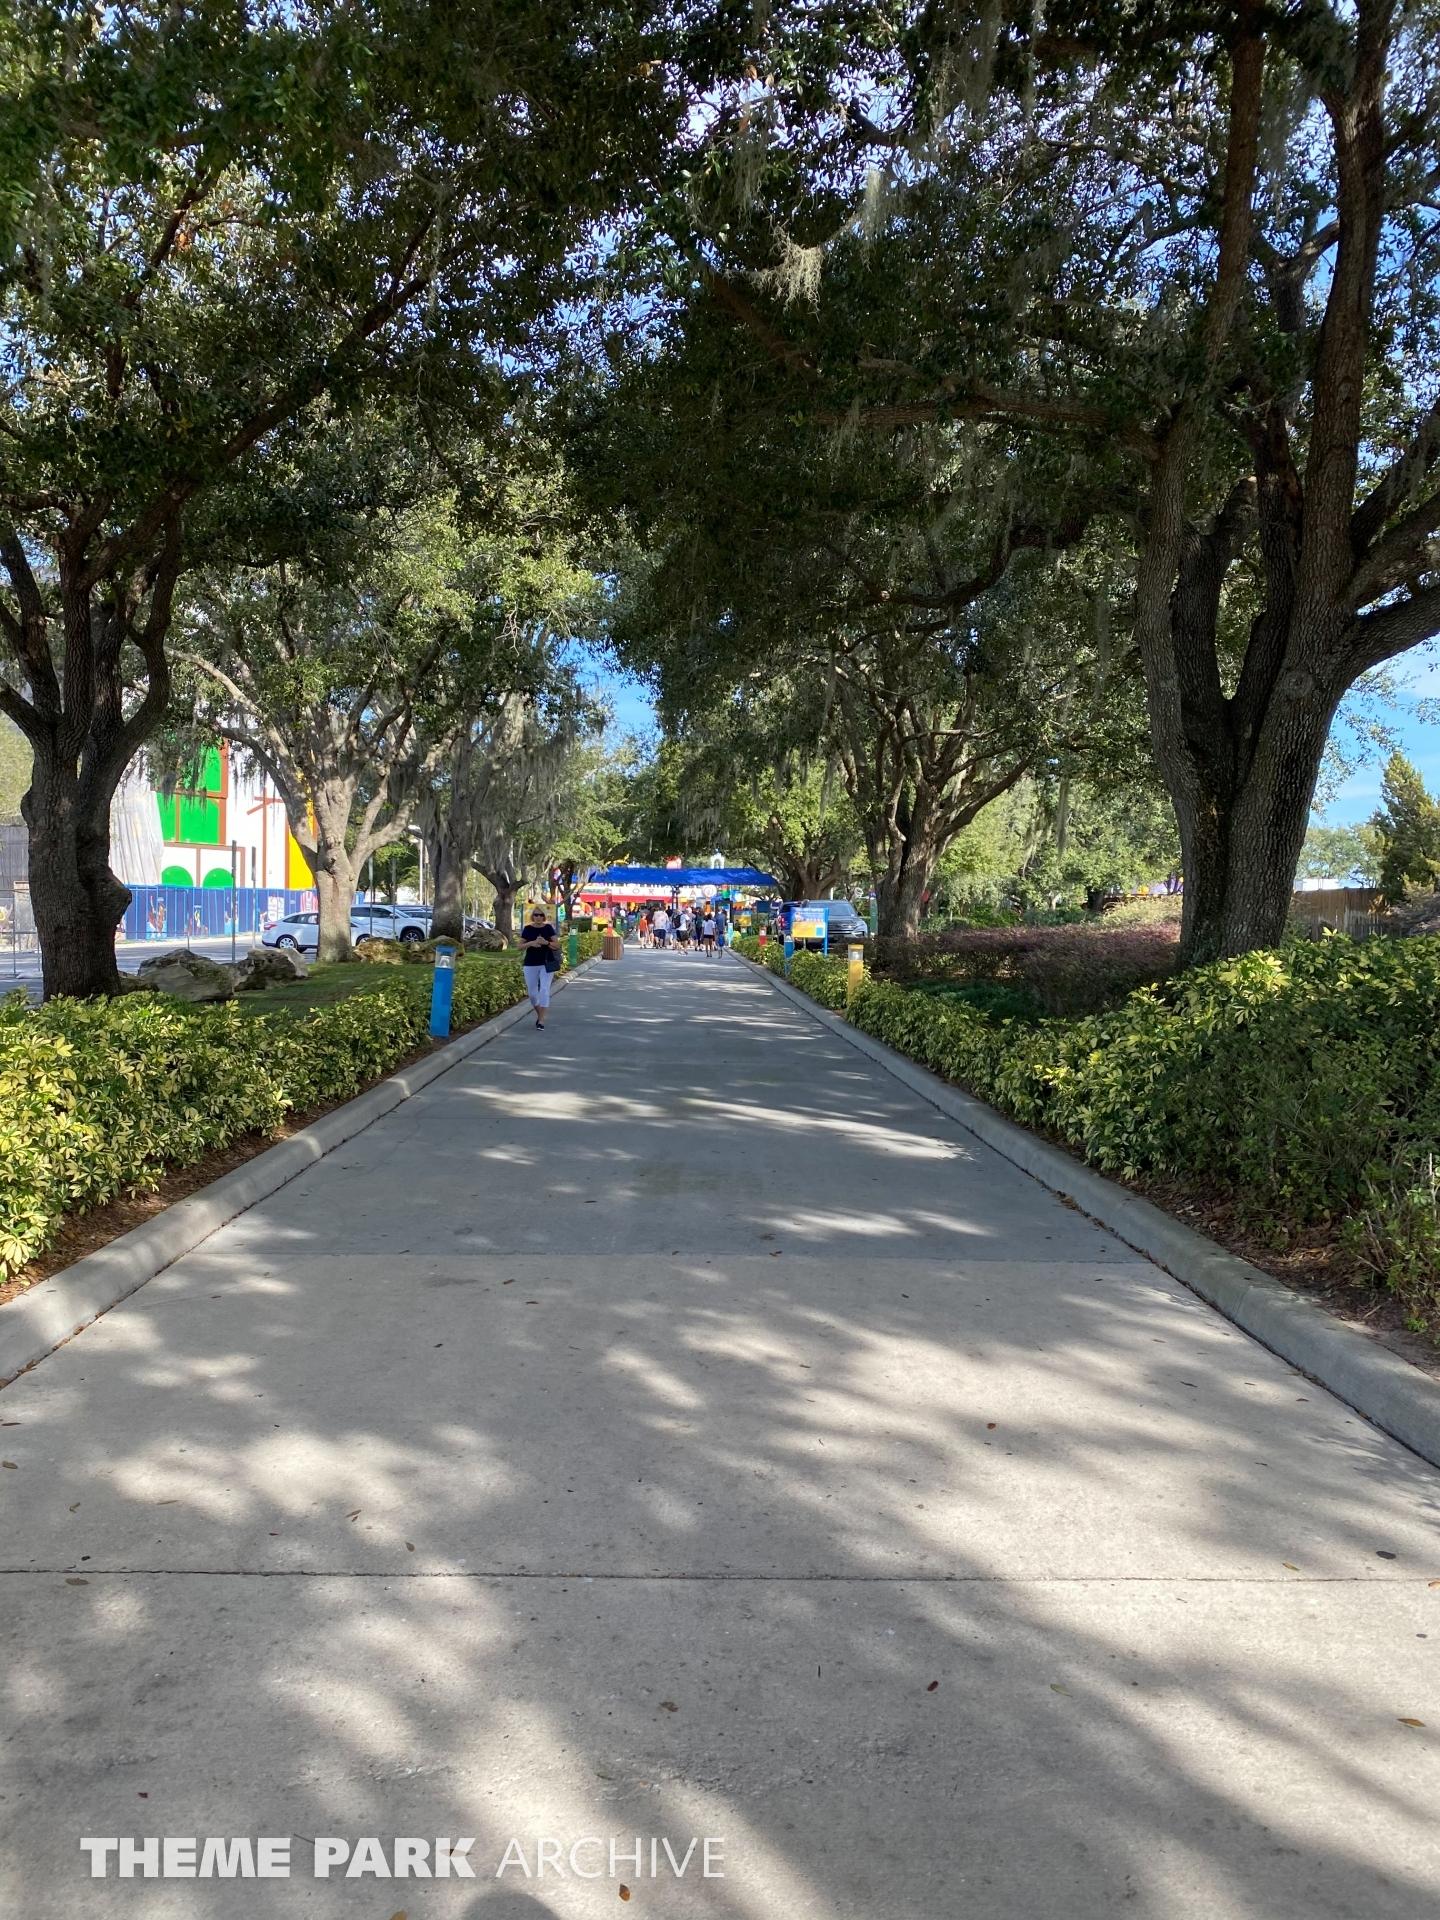 The Beginning at LEGOLAND Florida